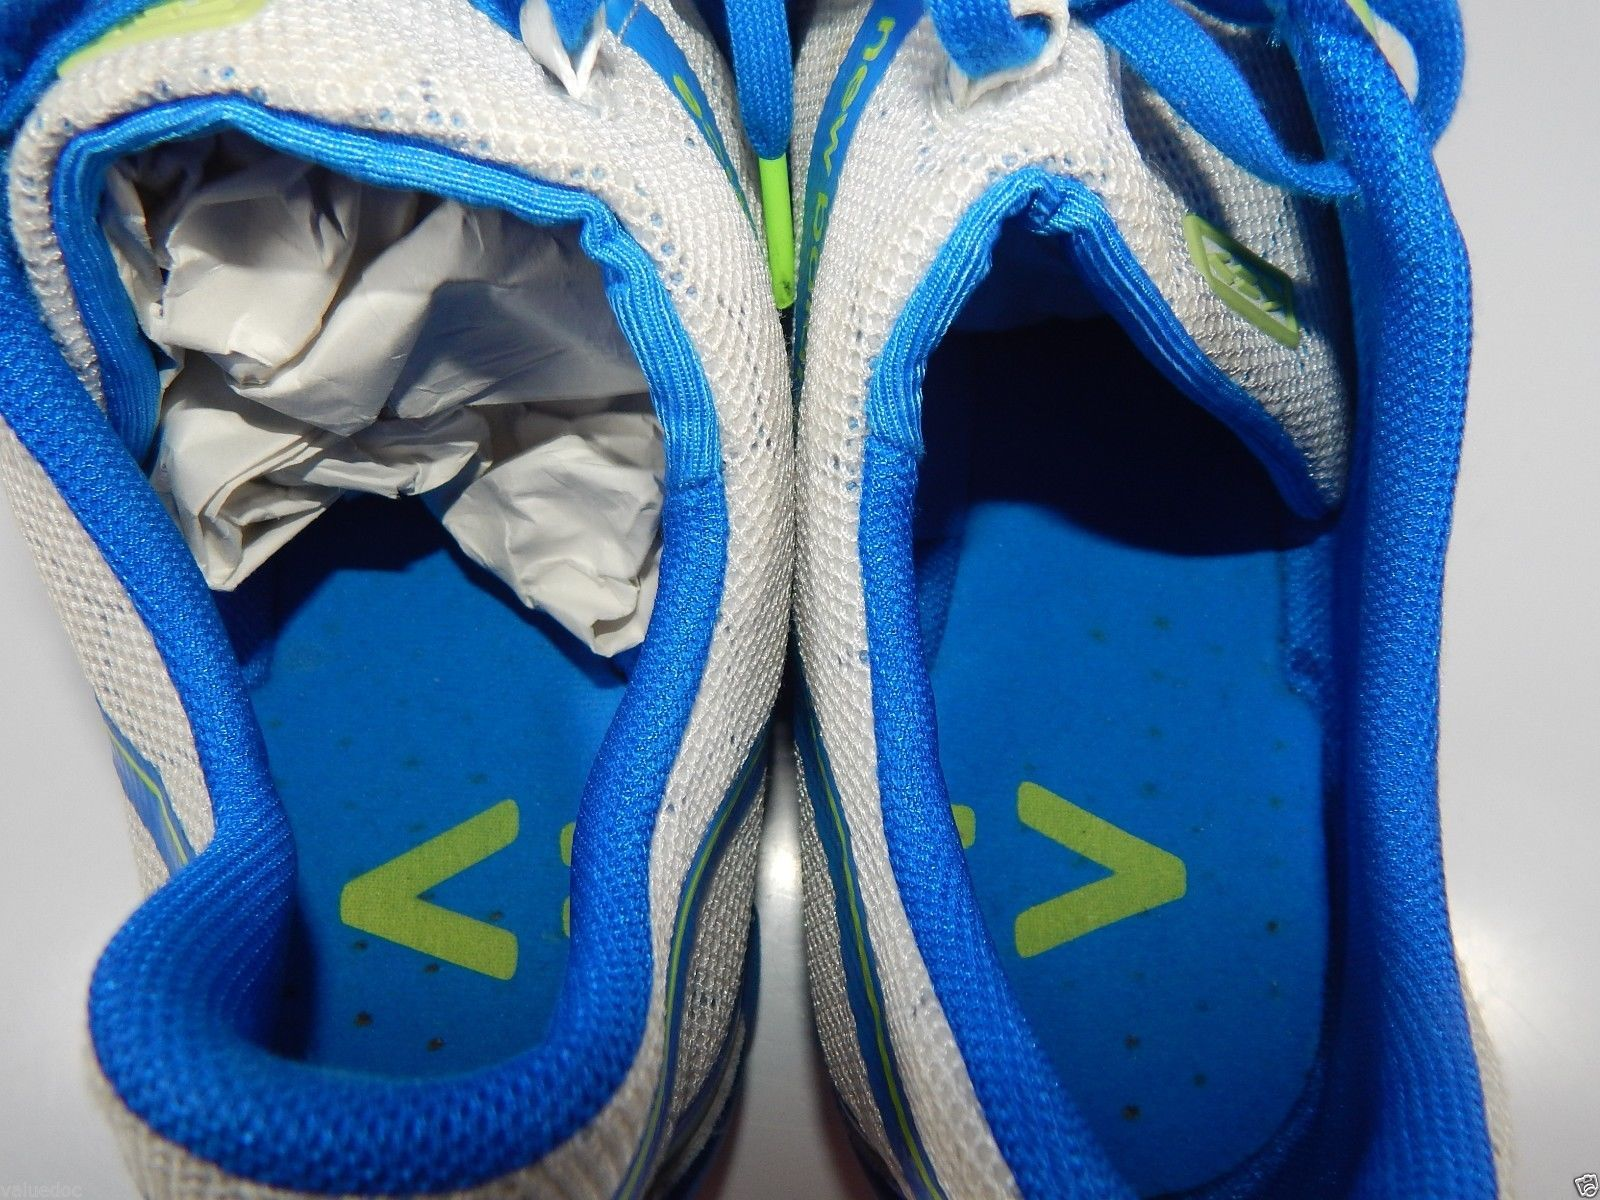 NEW BALANCE MINIMUS MENS RUNNING SHOES SZ US 11.5 M ( D ) EU 45.5 WHITE BLUE